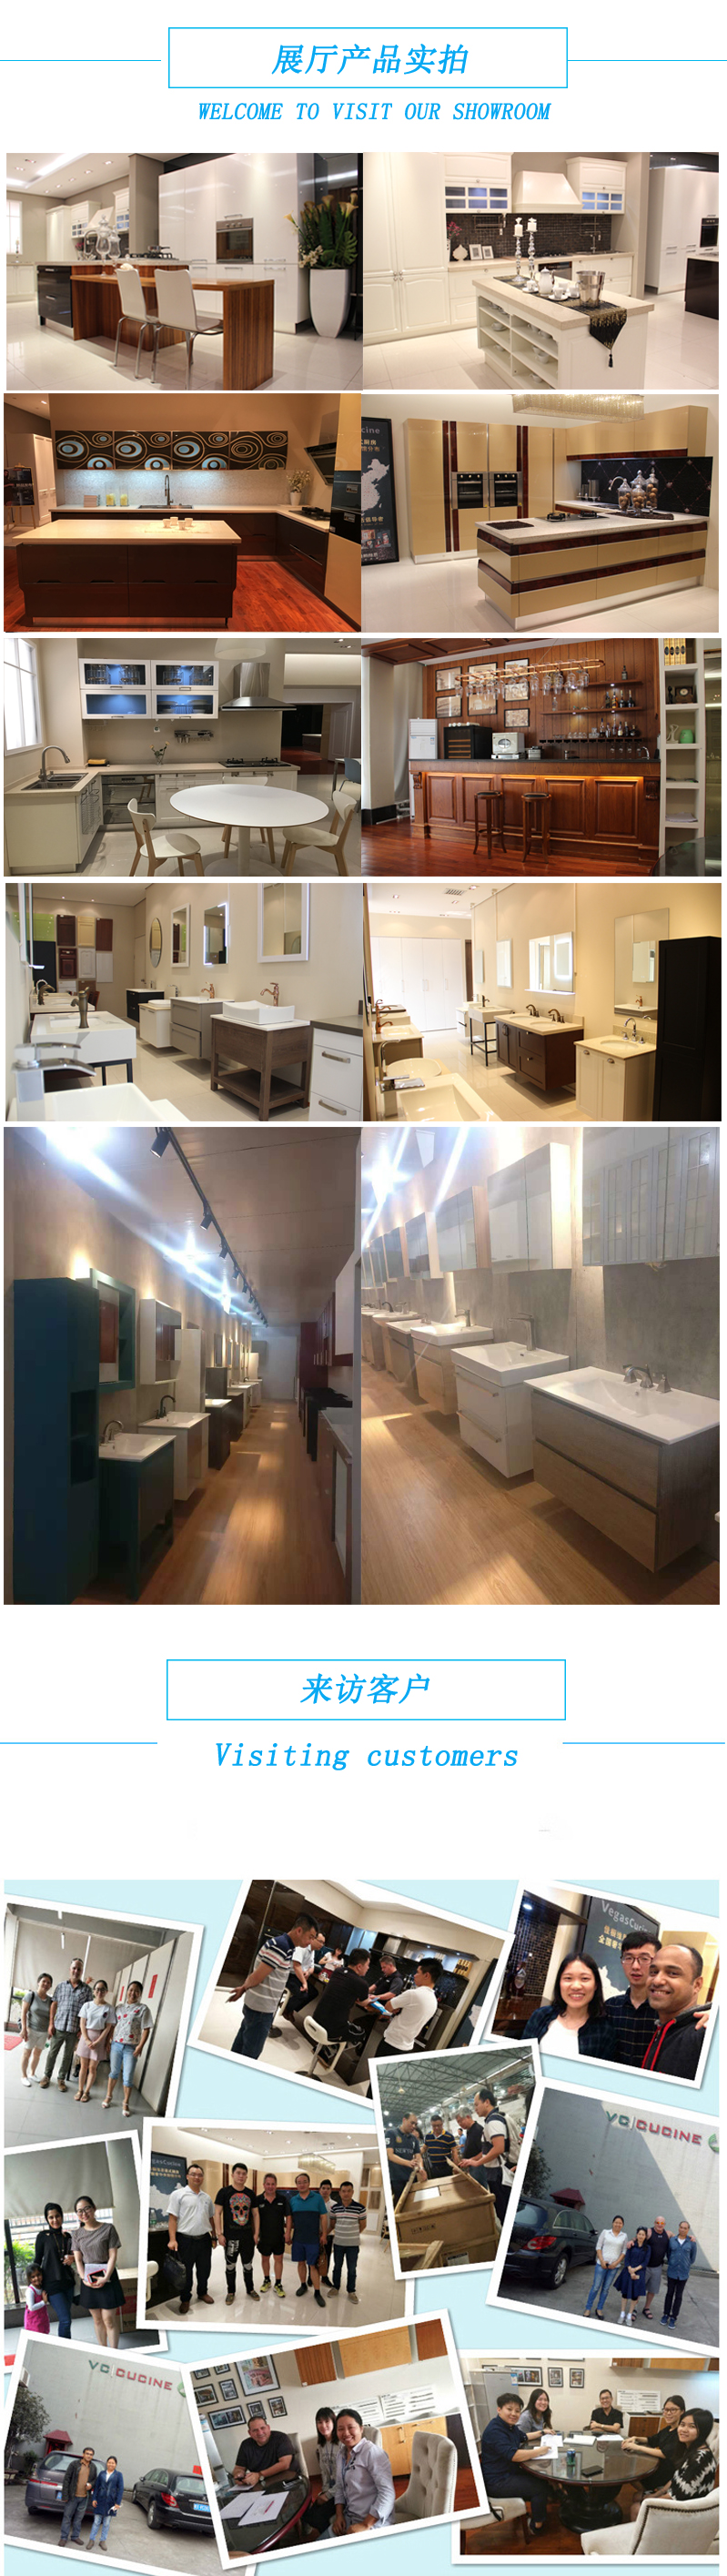 Foshan โรงงานขายส่งใหม่ออกแบบเฟอร์นิเจอร์โมเดิร์นเลื่อนประตูห้องนอนตู้เสื้อผ้า